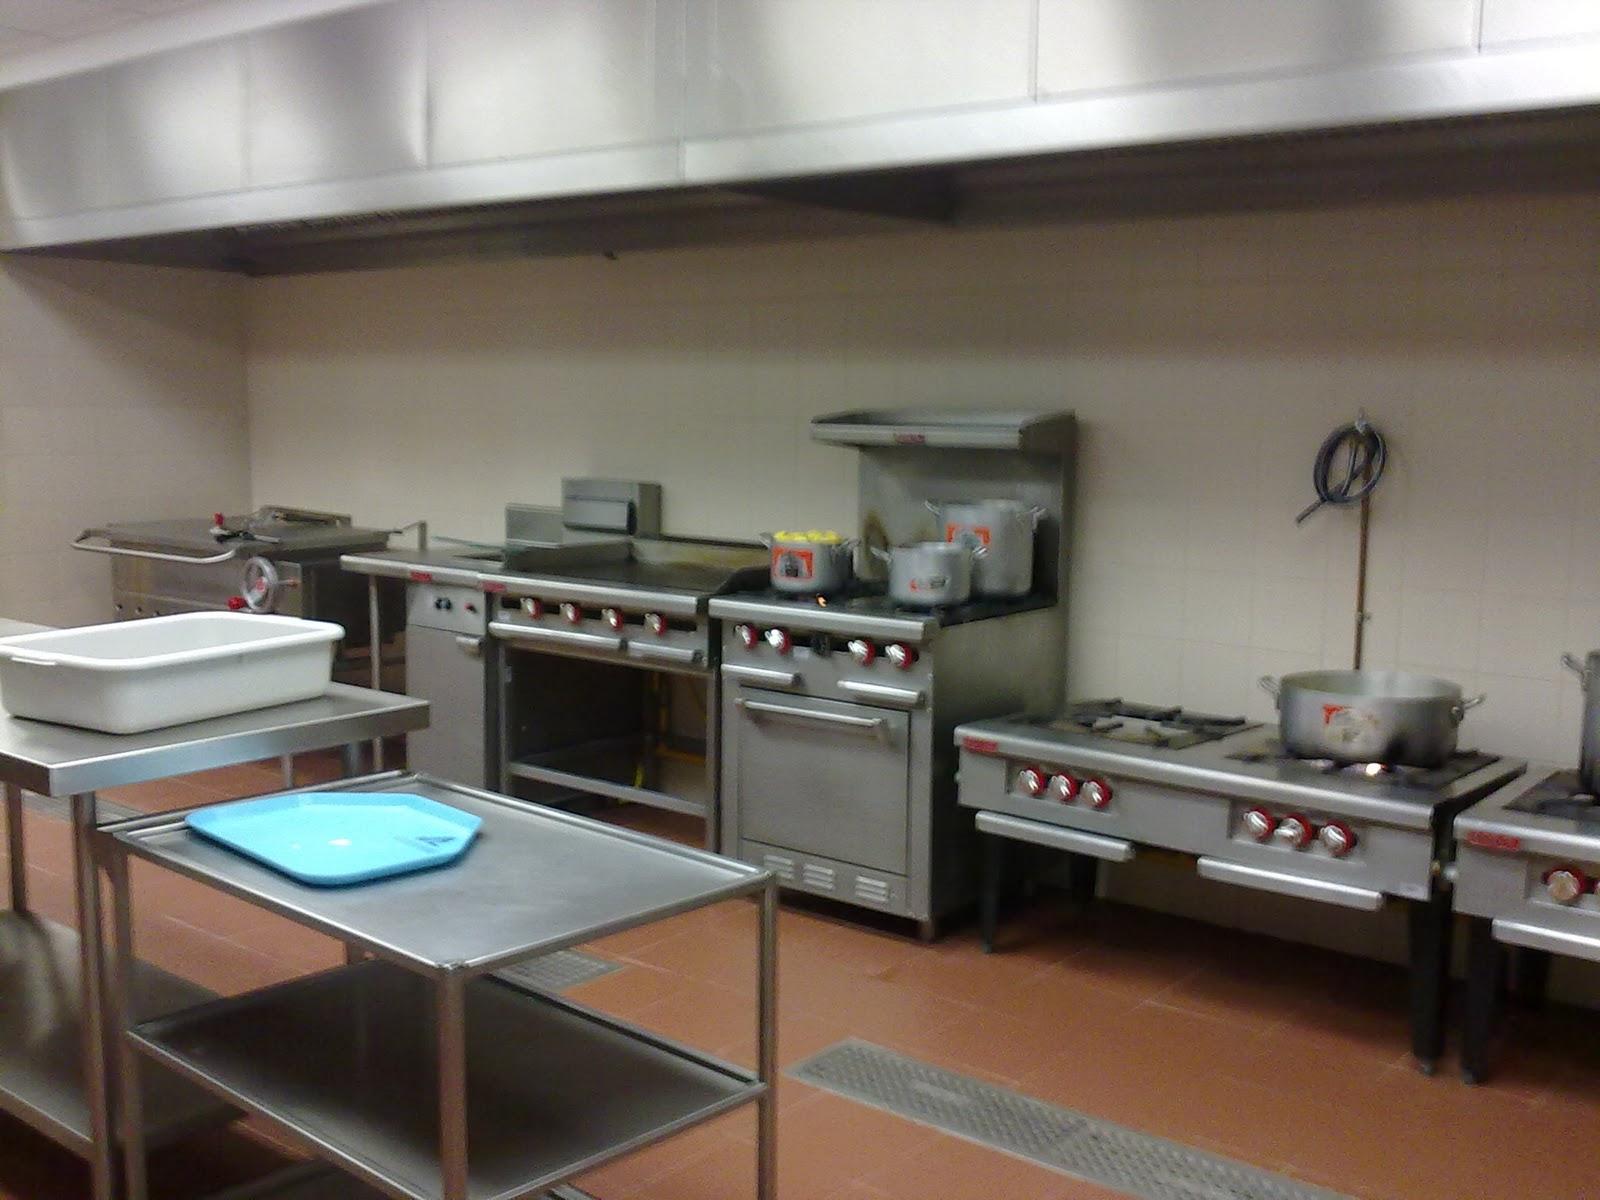 Jennifer andrade servicios comedor industrial hgz for Almacen para cocina